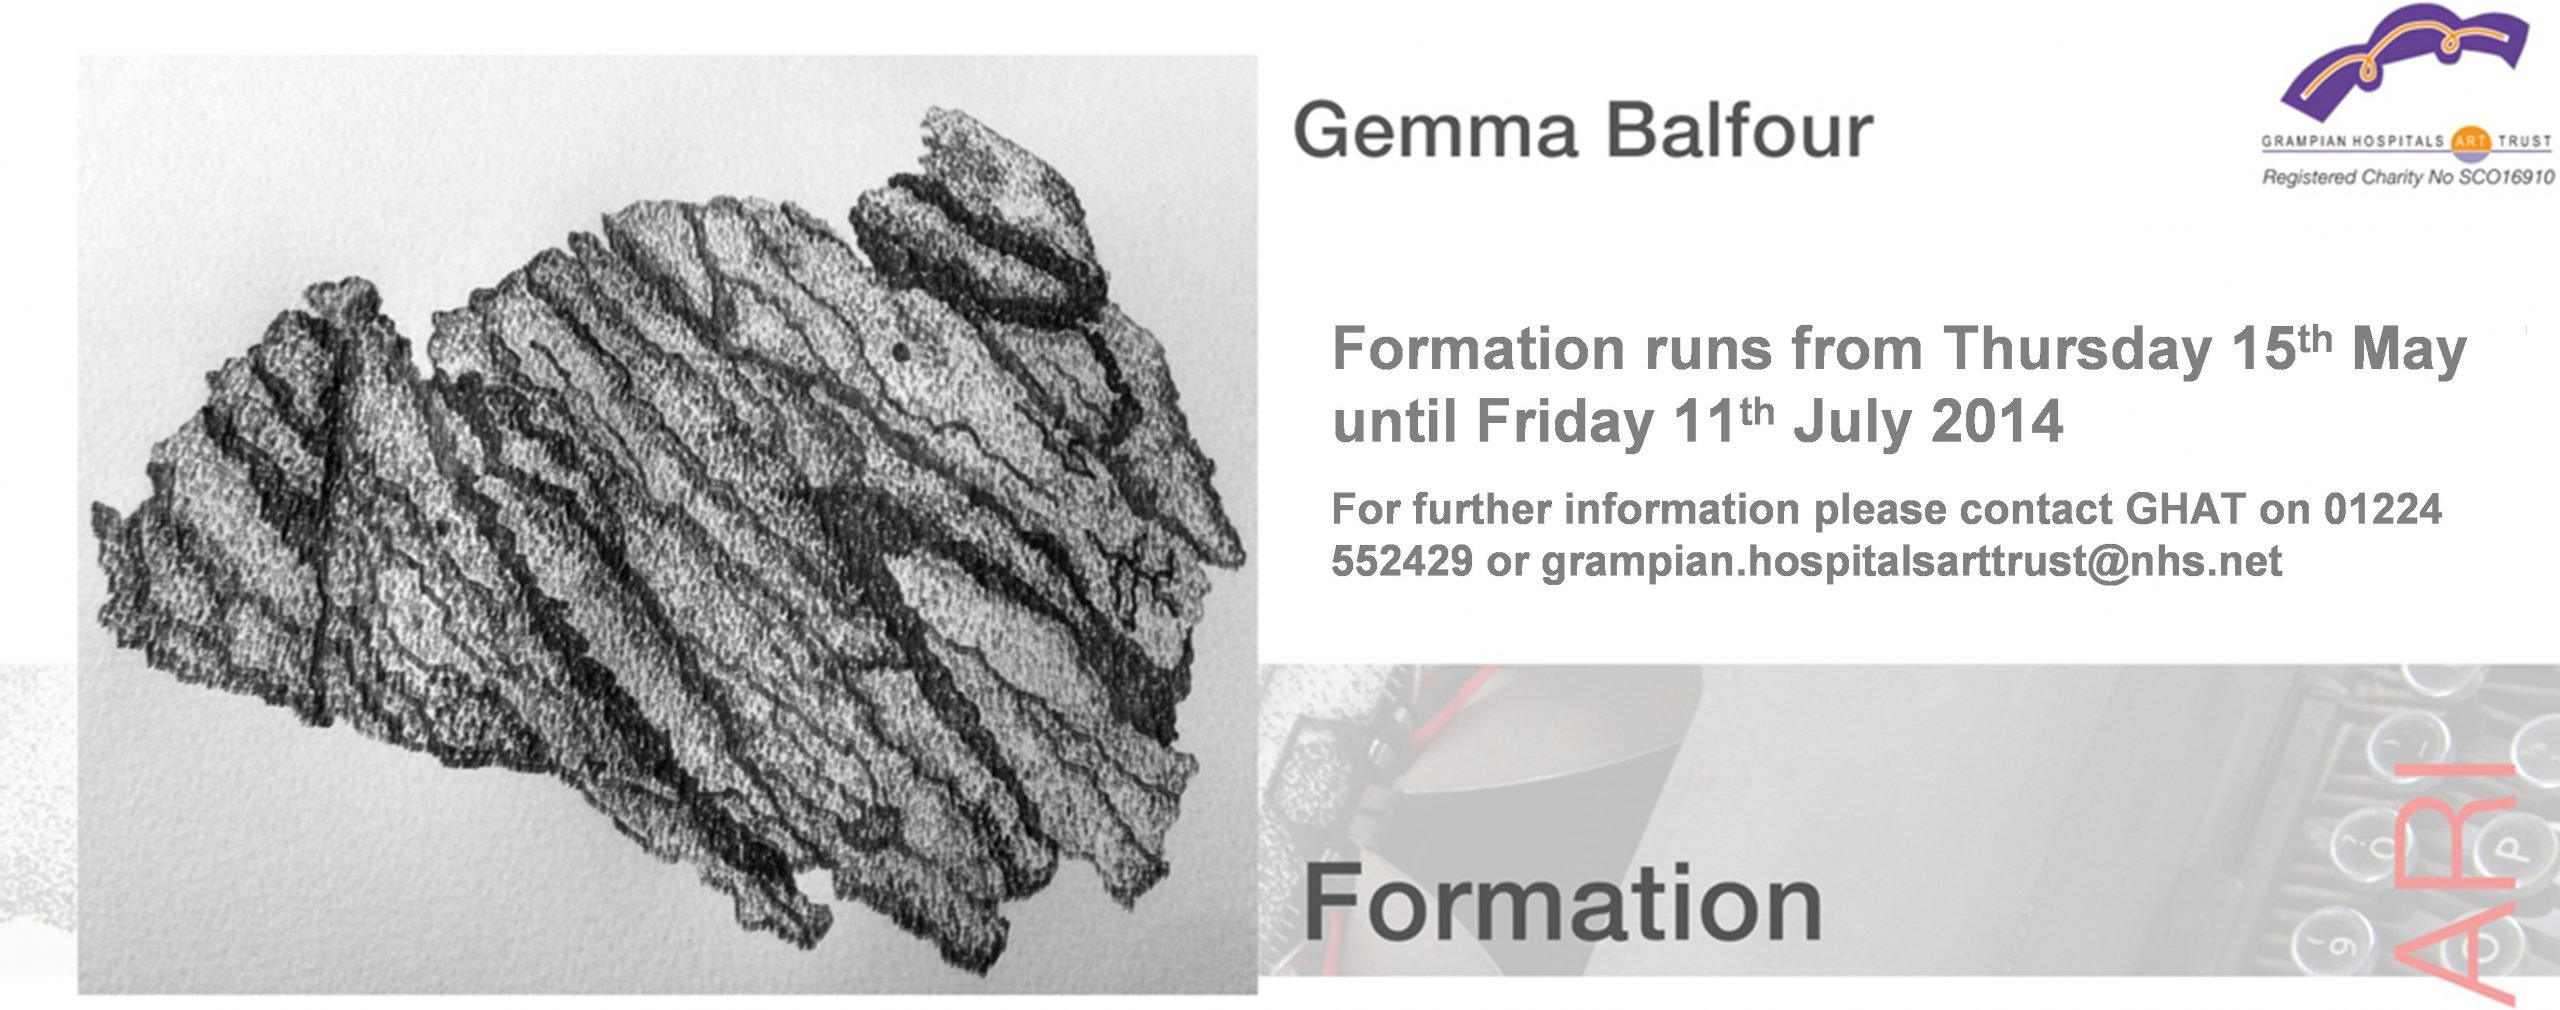 Formation: Gemma Balfour